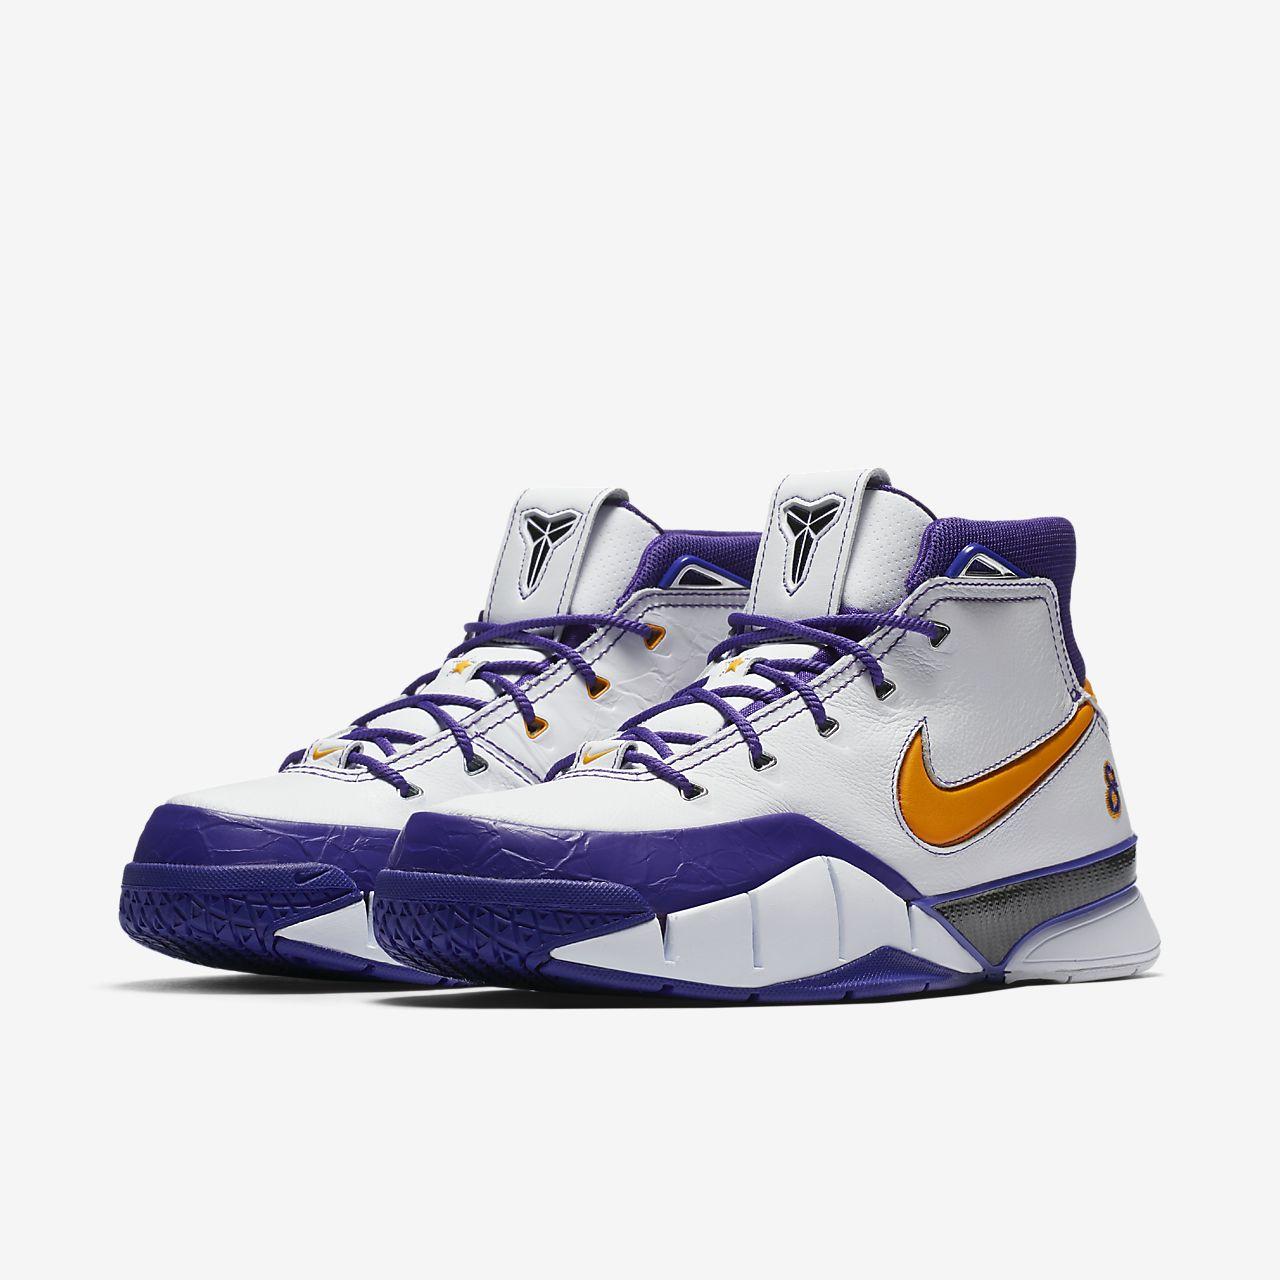 hot sale online a40a0 d4b20 Kobe 1 Protro Basketball Shoe. Nike.com MY